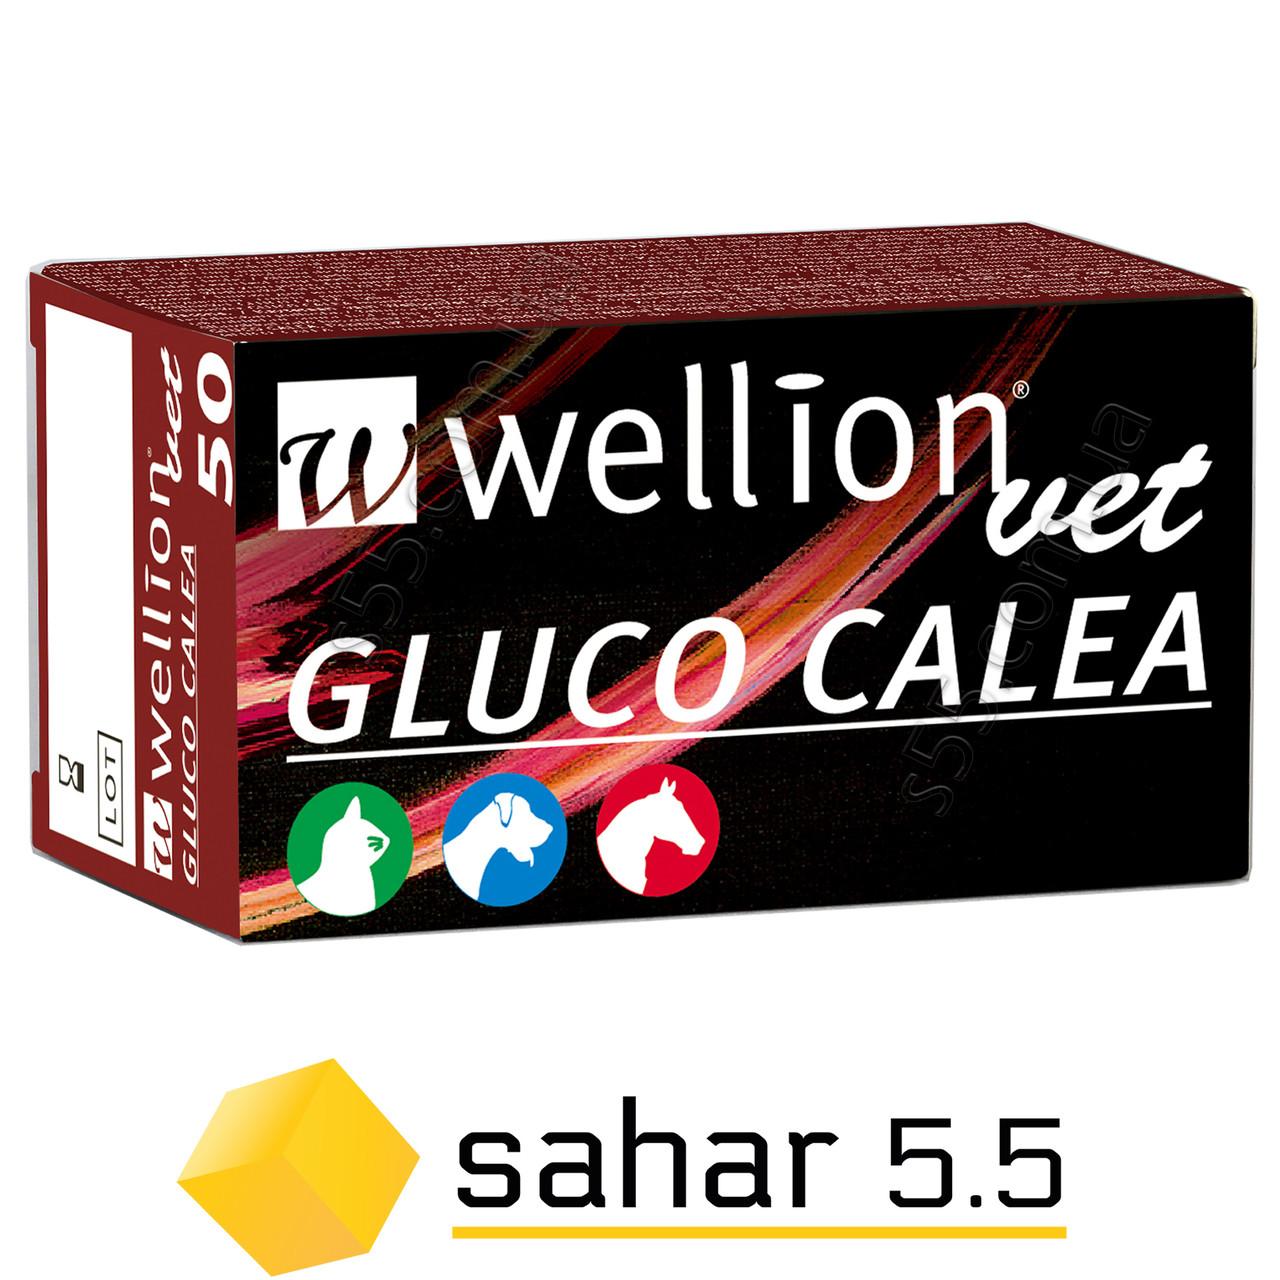 Тест полоски Wellion Vet Gluco Calea 50 шт. - Веллион Вет Глюко Калеа